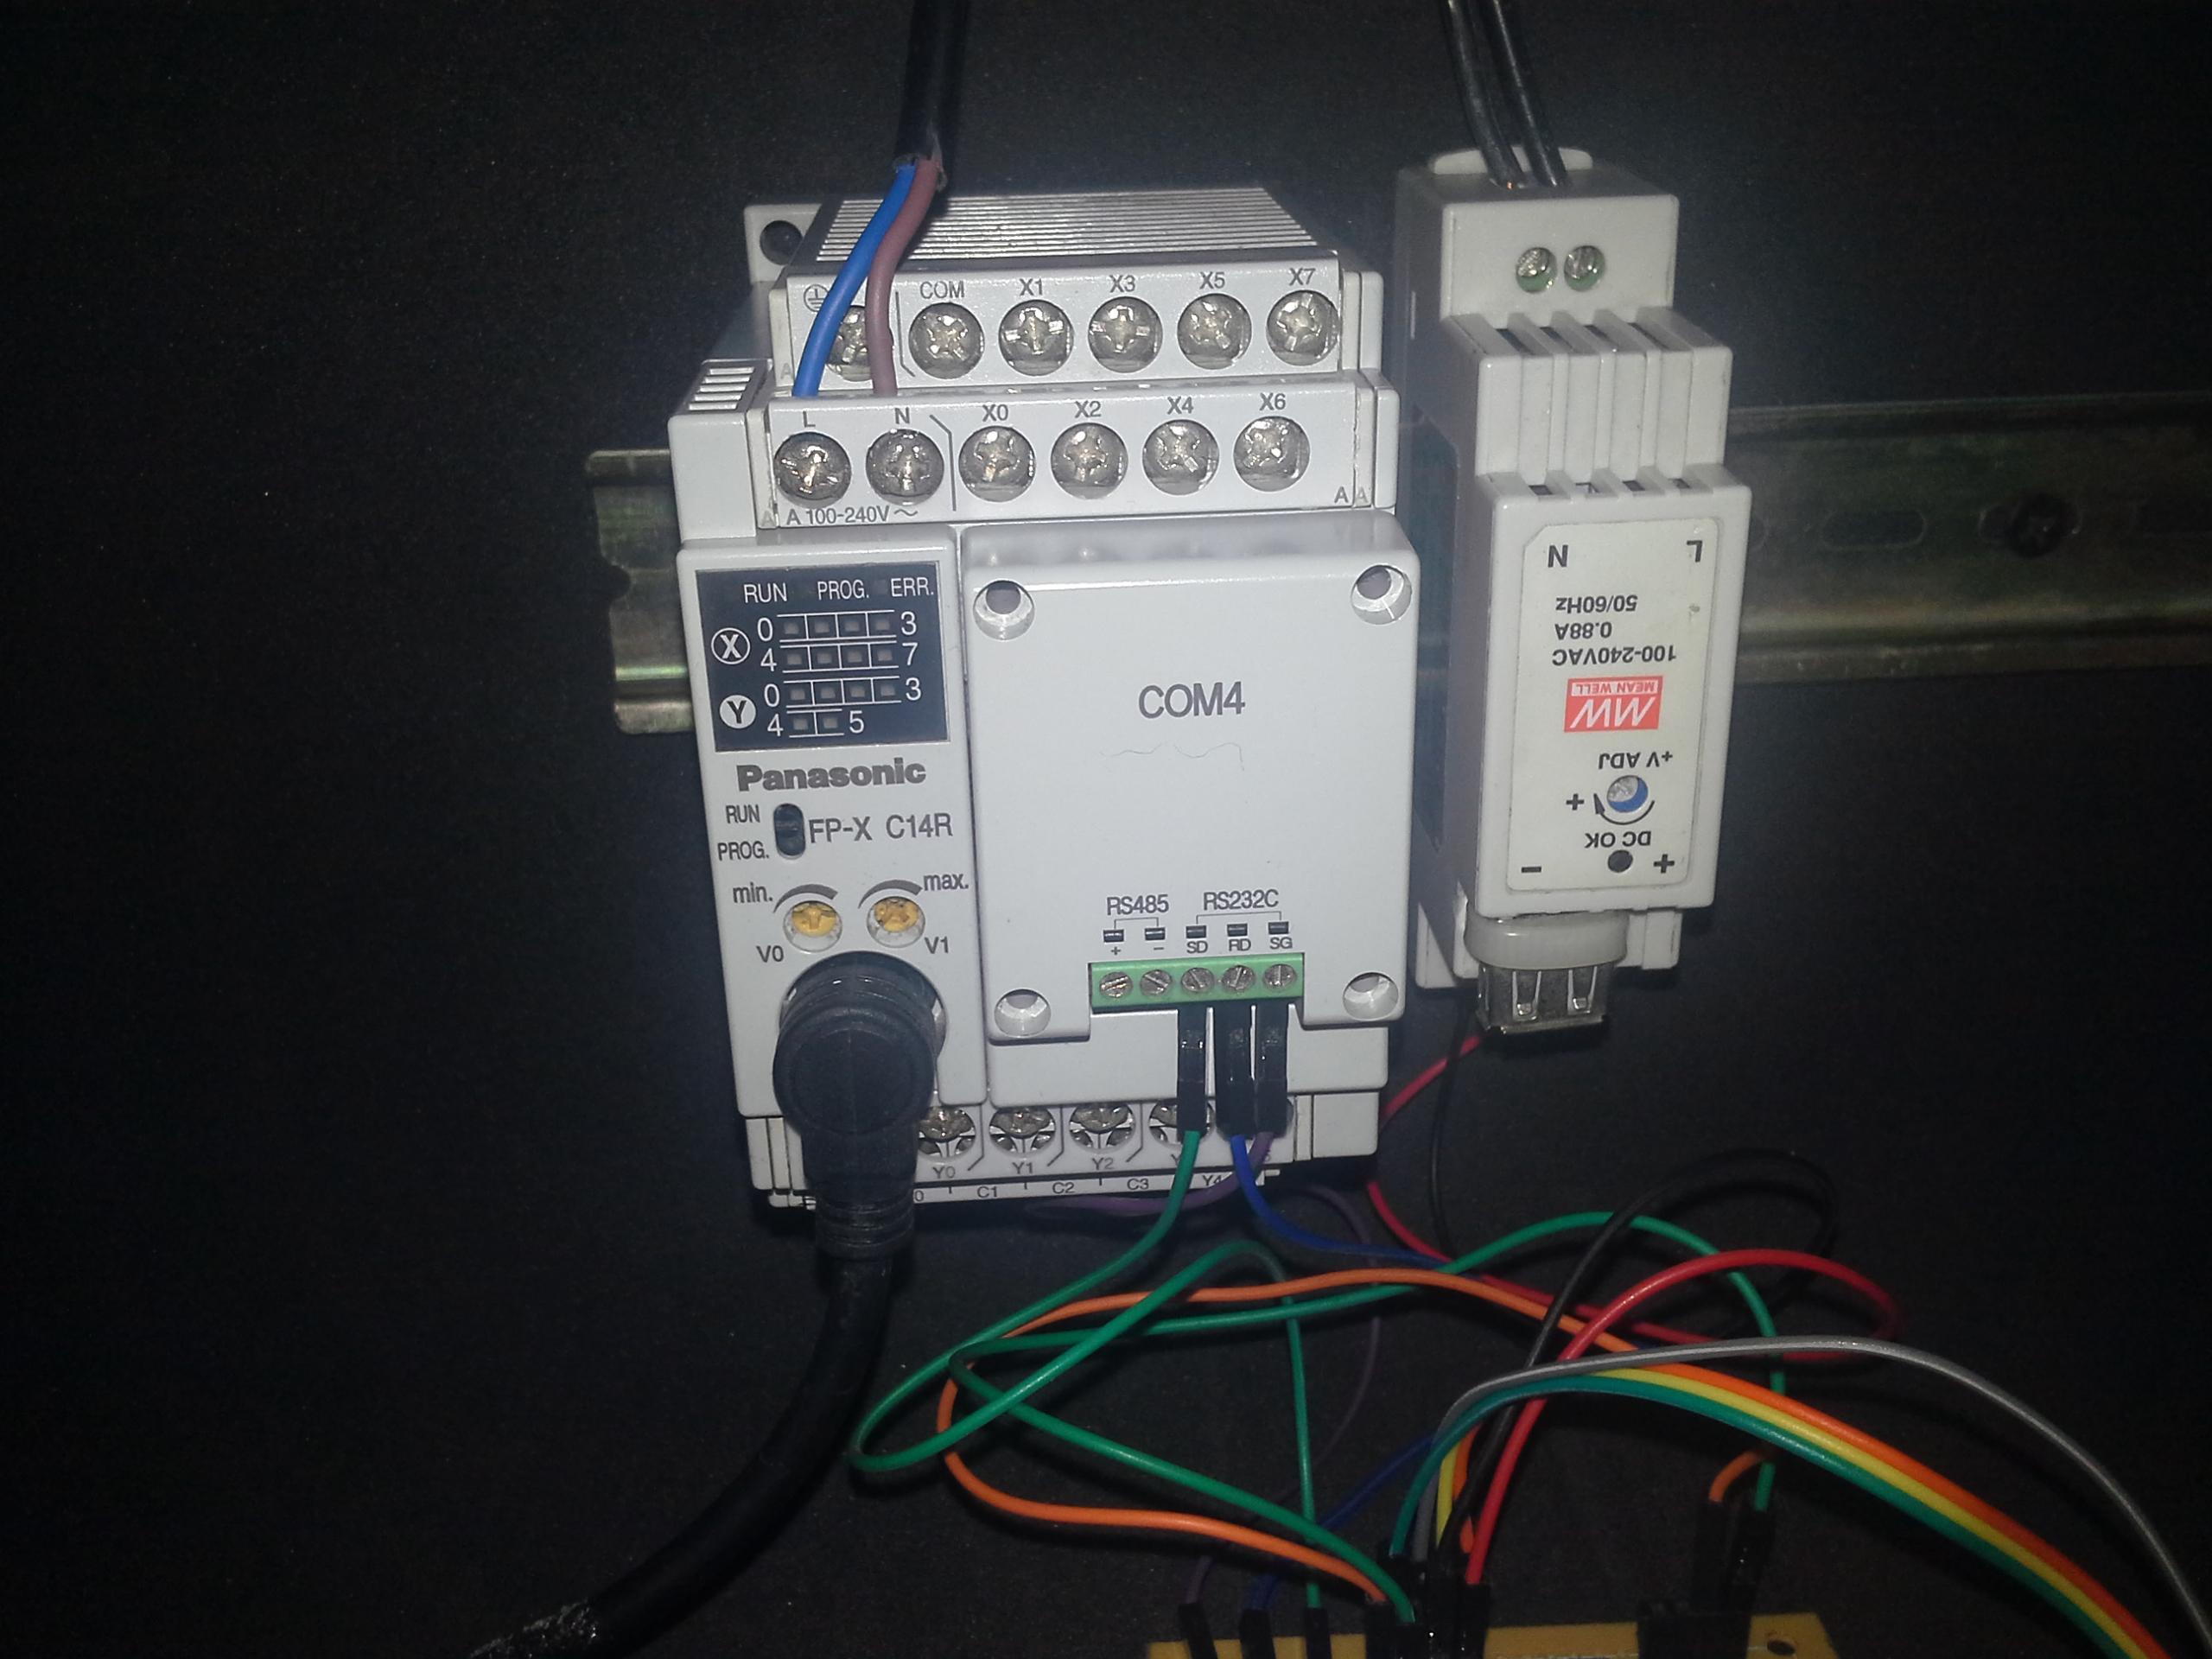 PLC Panasonic FPX C14 R